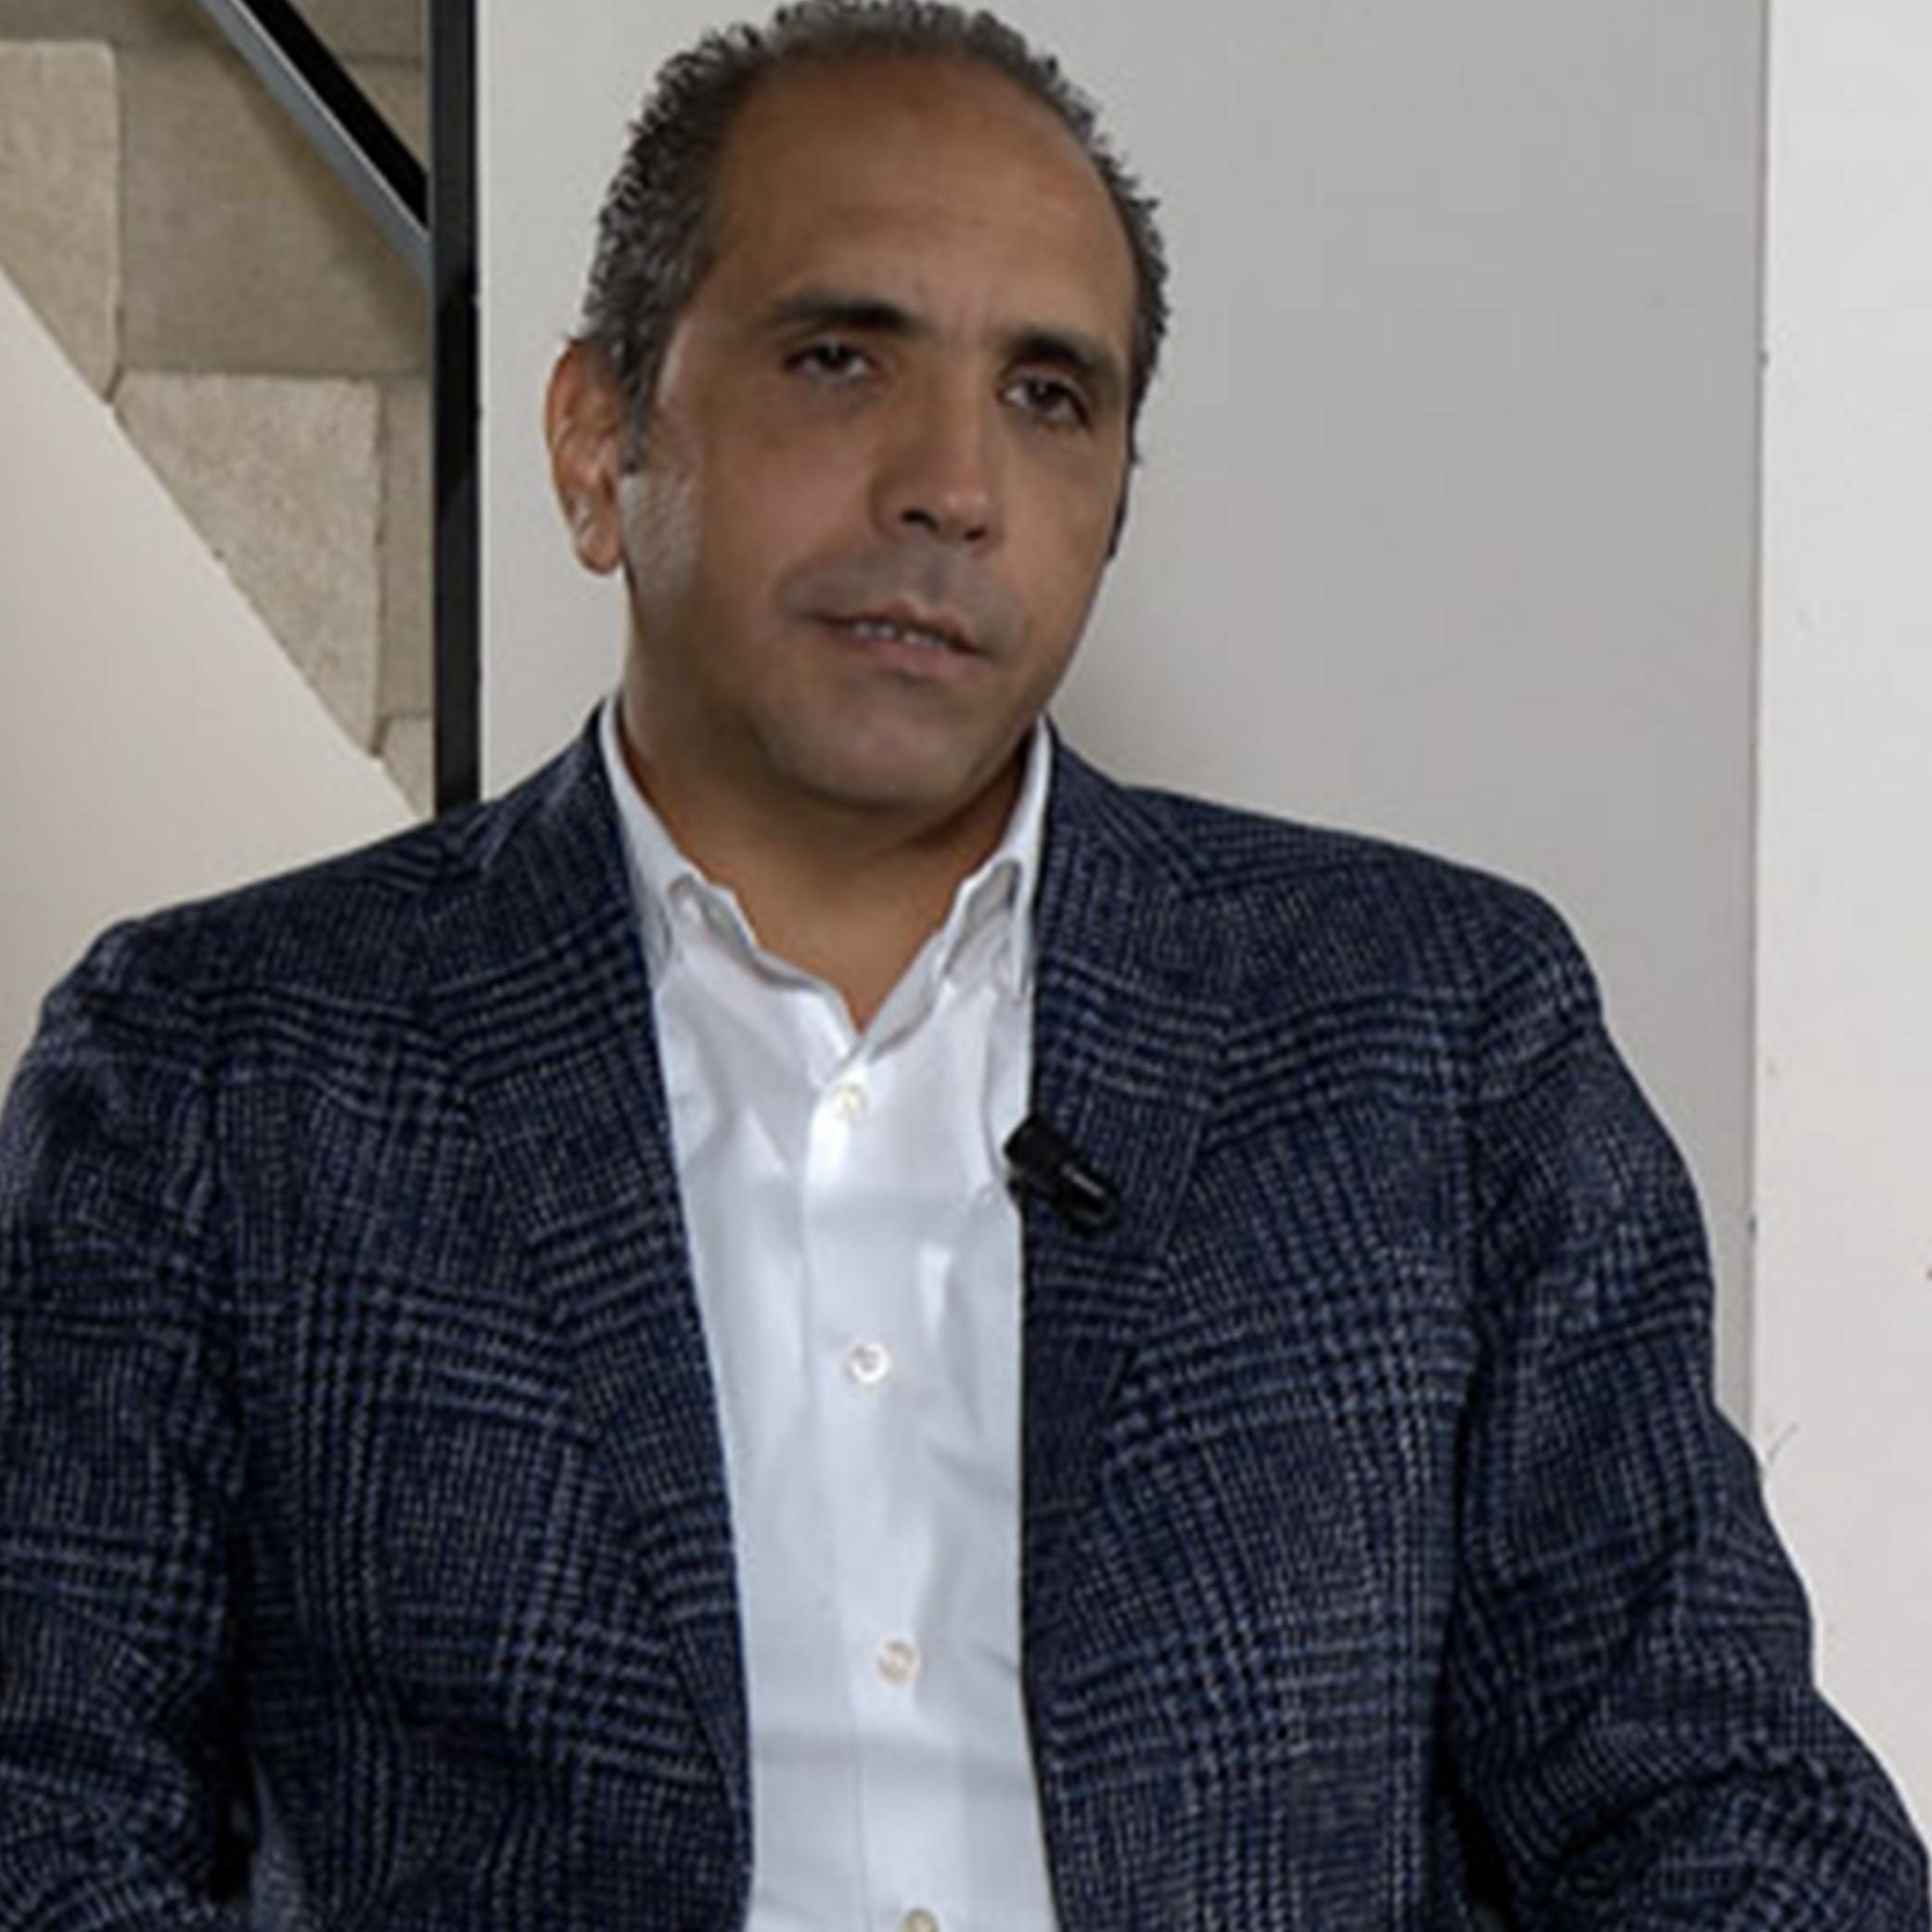 Prof.Leonardo   Tagliente   Docente UNIRSM - Esperto di start up